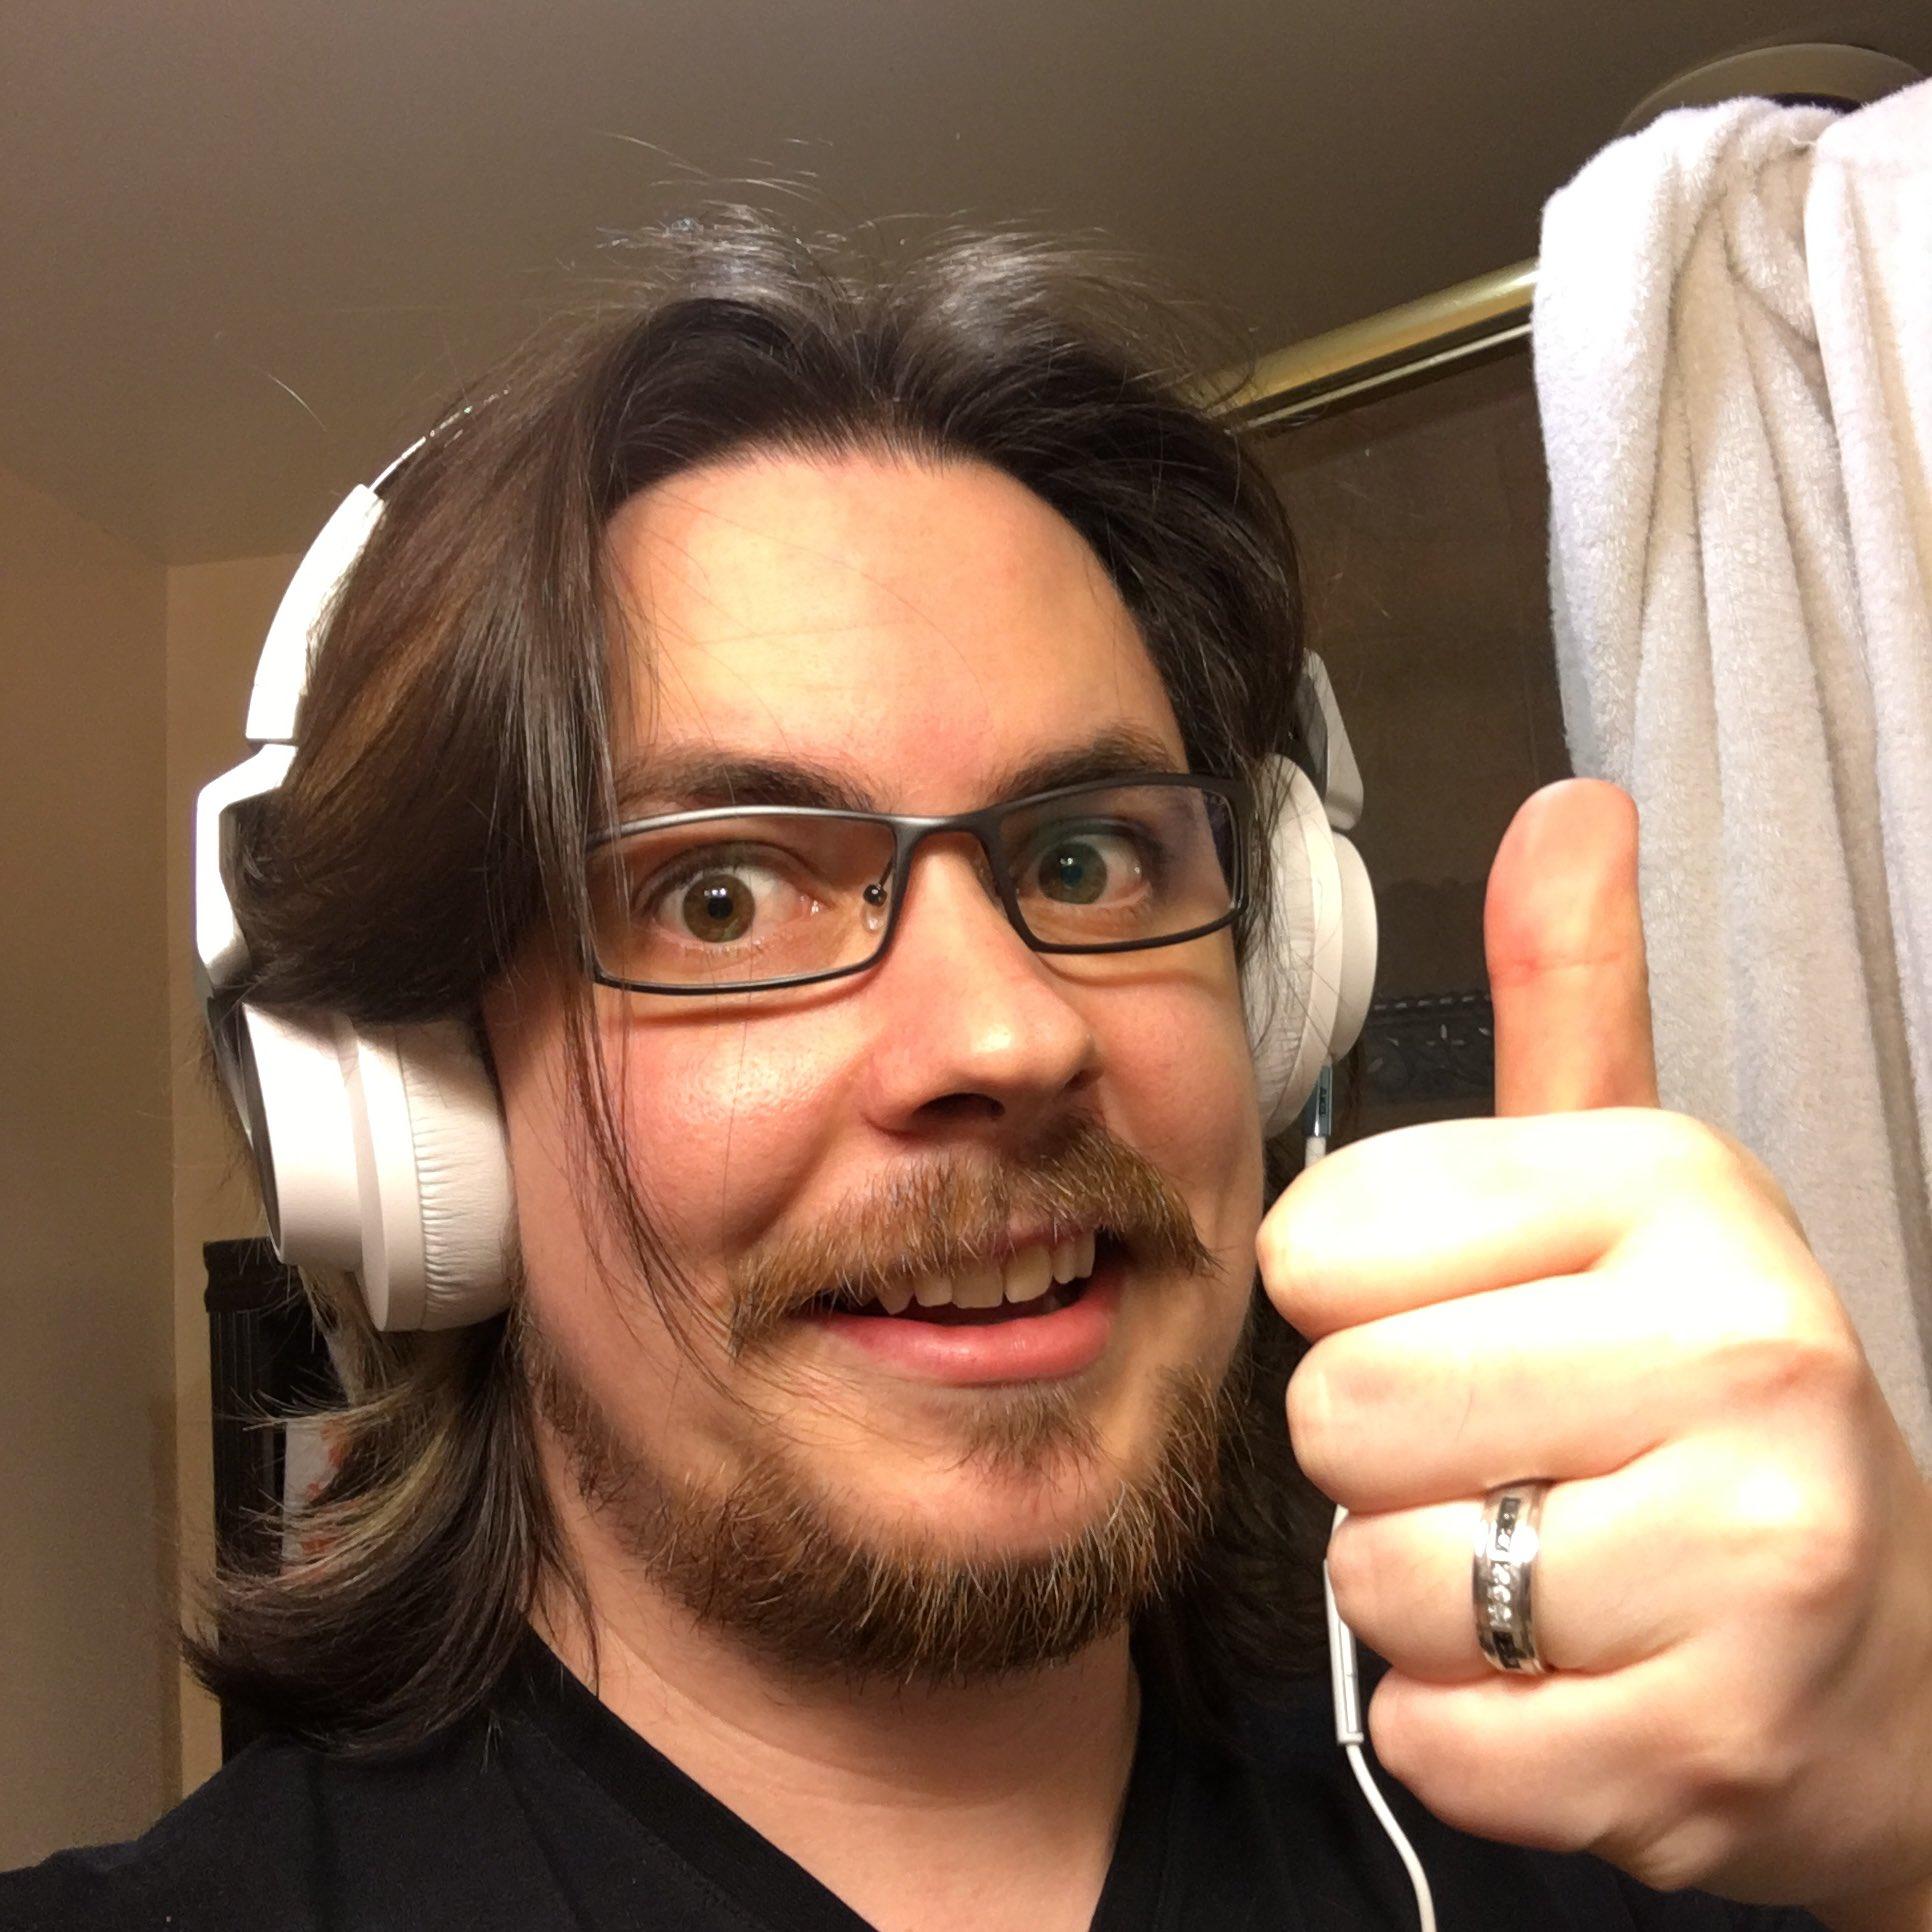 "Arin ""Arin"" Hanson on Twitter: ""Got new @GUNNAROptiks ..."